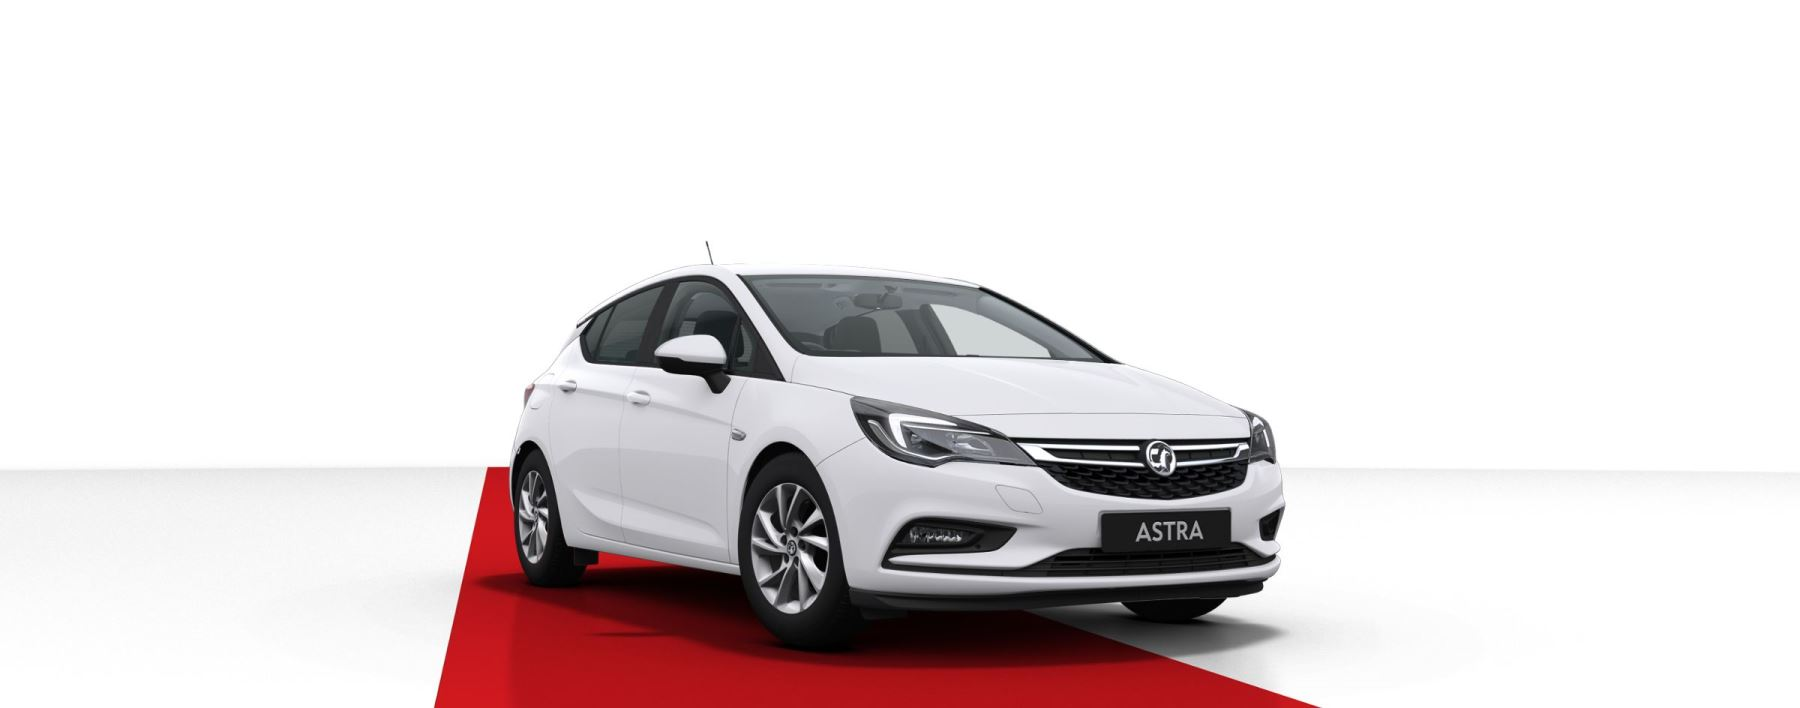 Vauxhall Astra 1.4 150 SRi